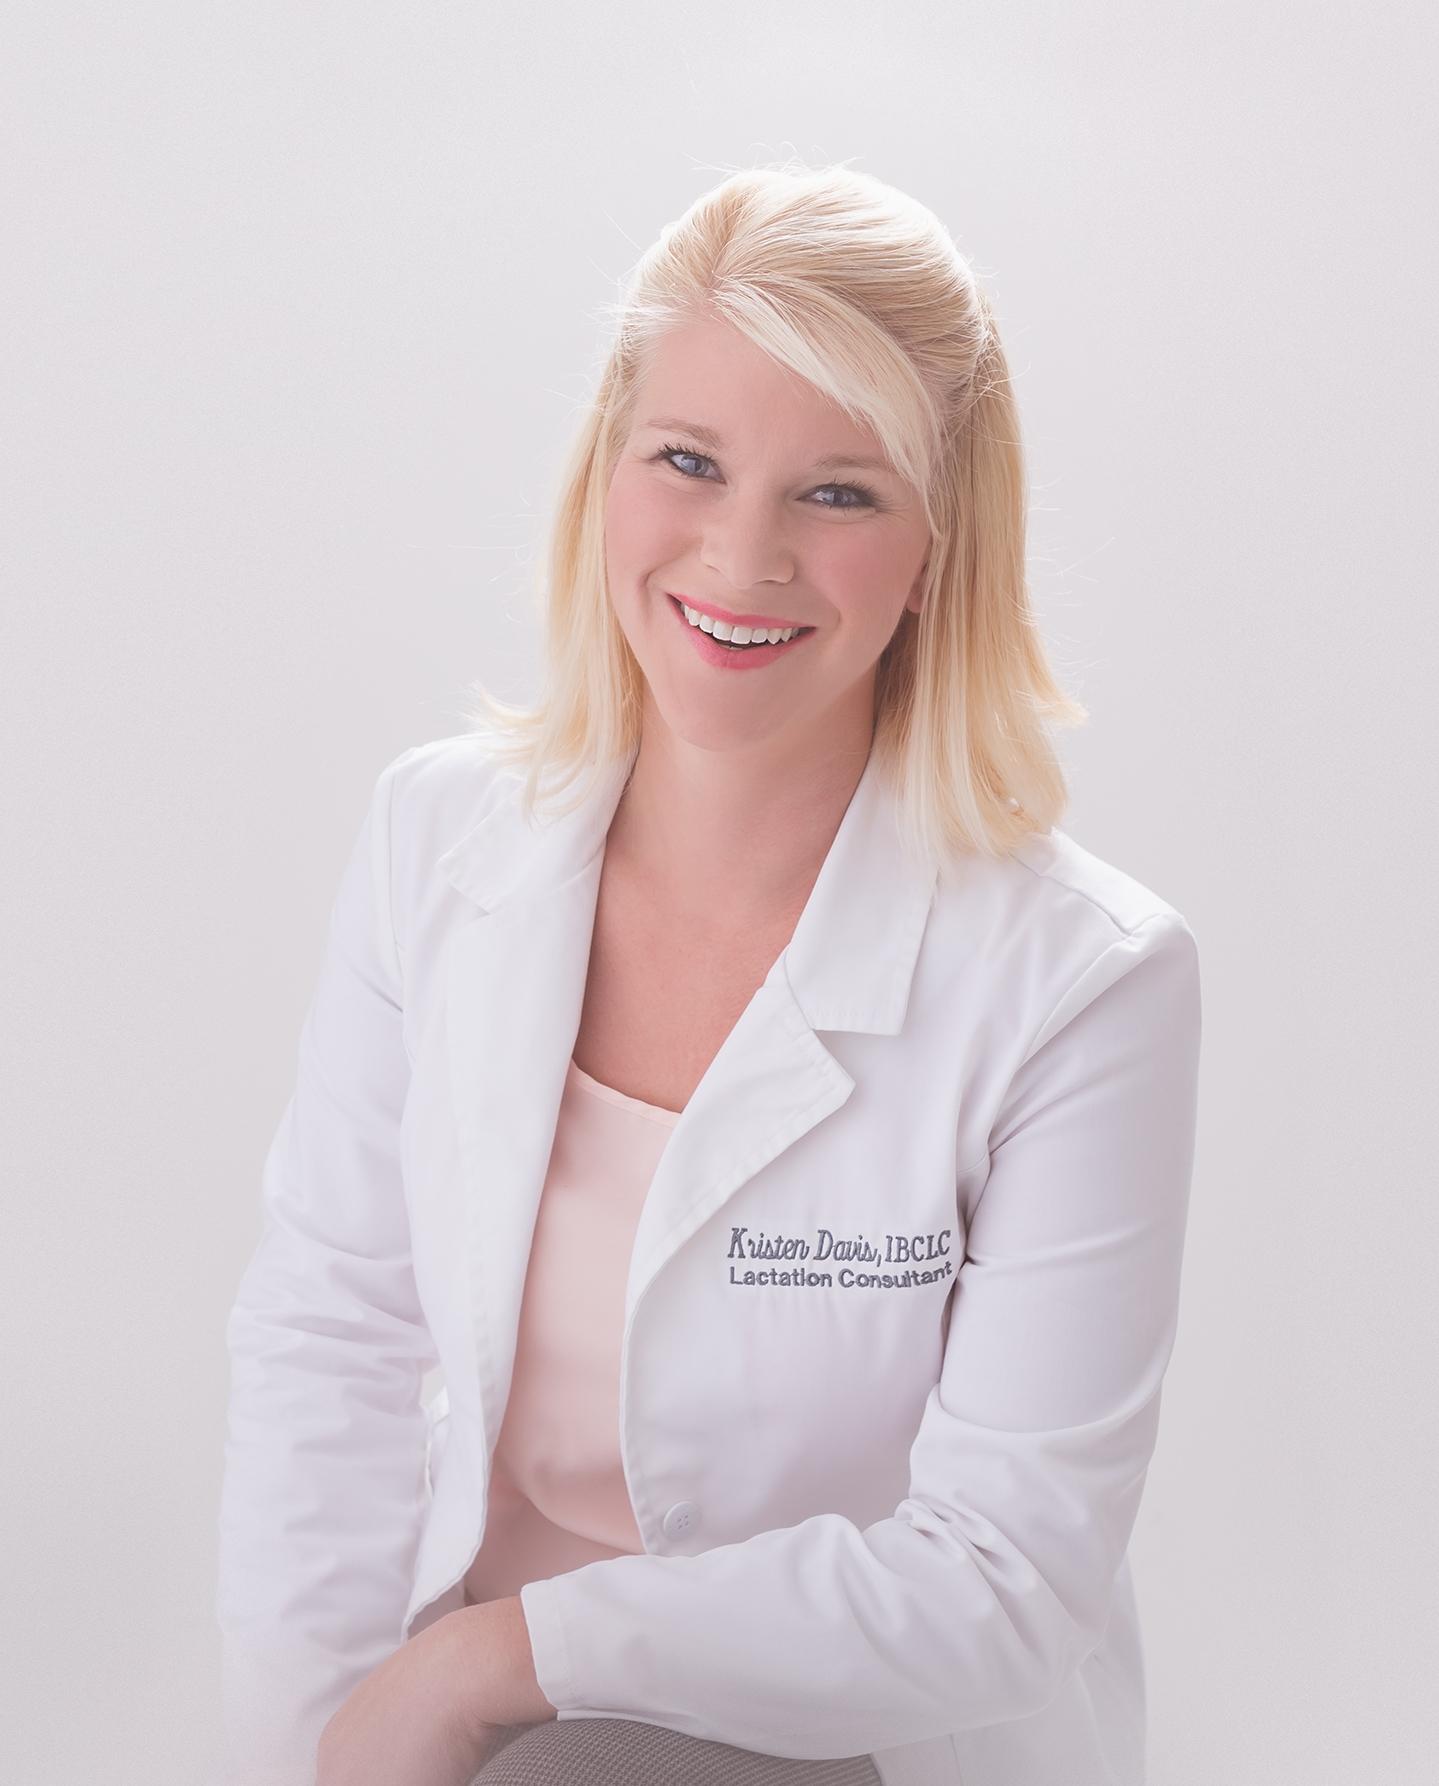 Kristen Davis, IBCLC, Breast4Baby Owner